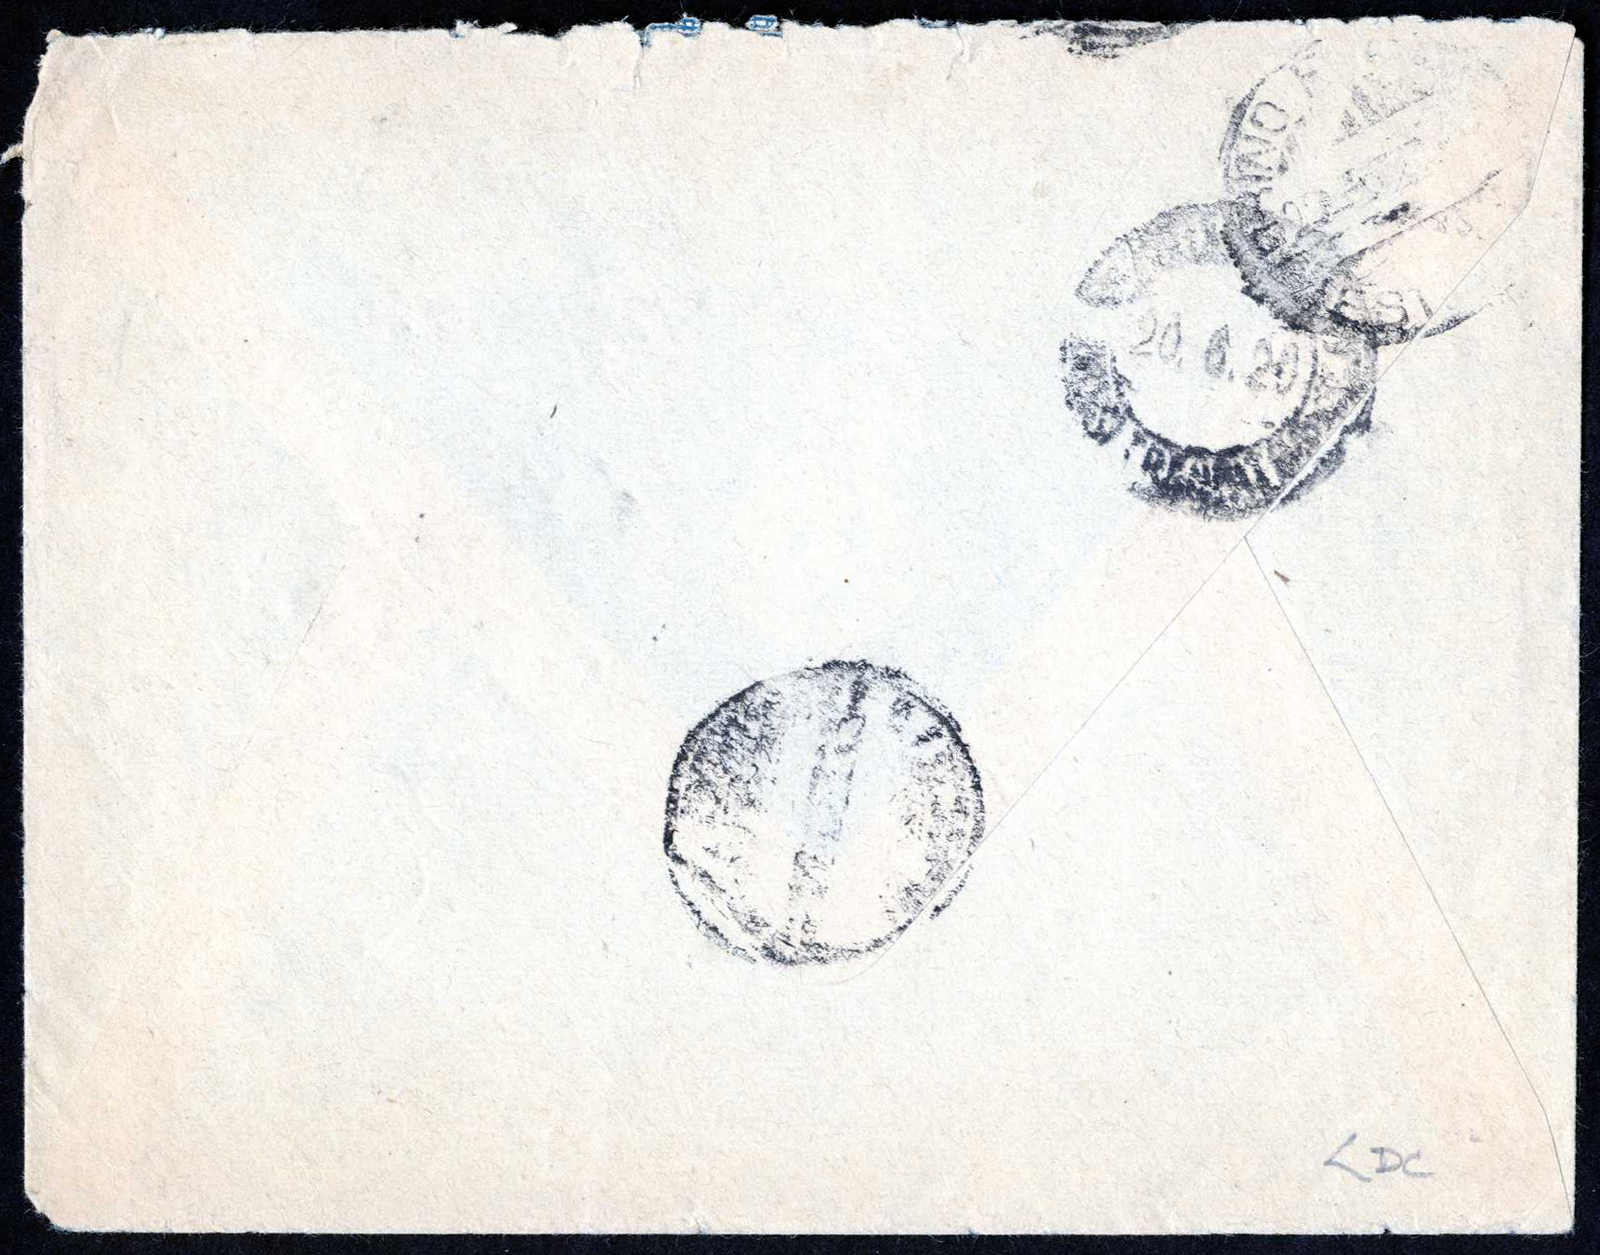 Lot 1051 - andere gebiete italienisch eritrea -  HA HARMERS AUCTIONS S.A. Treasure Hunt 3